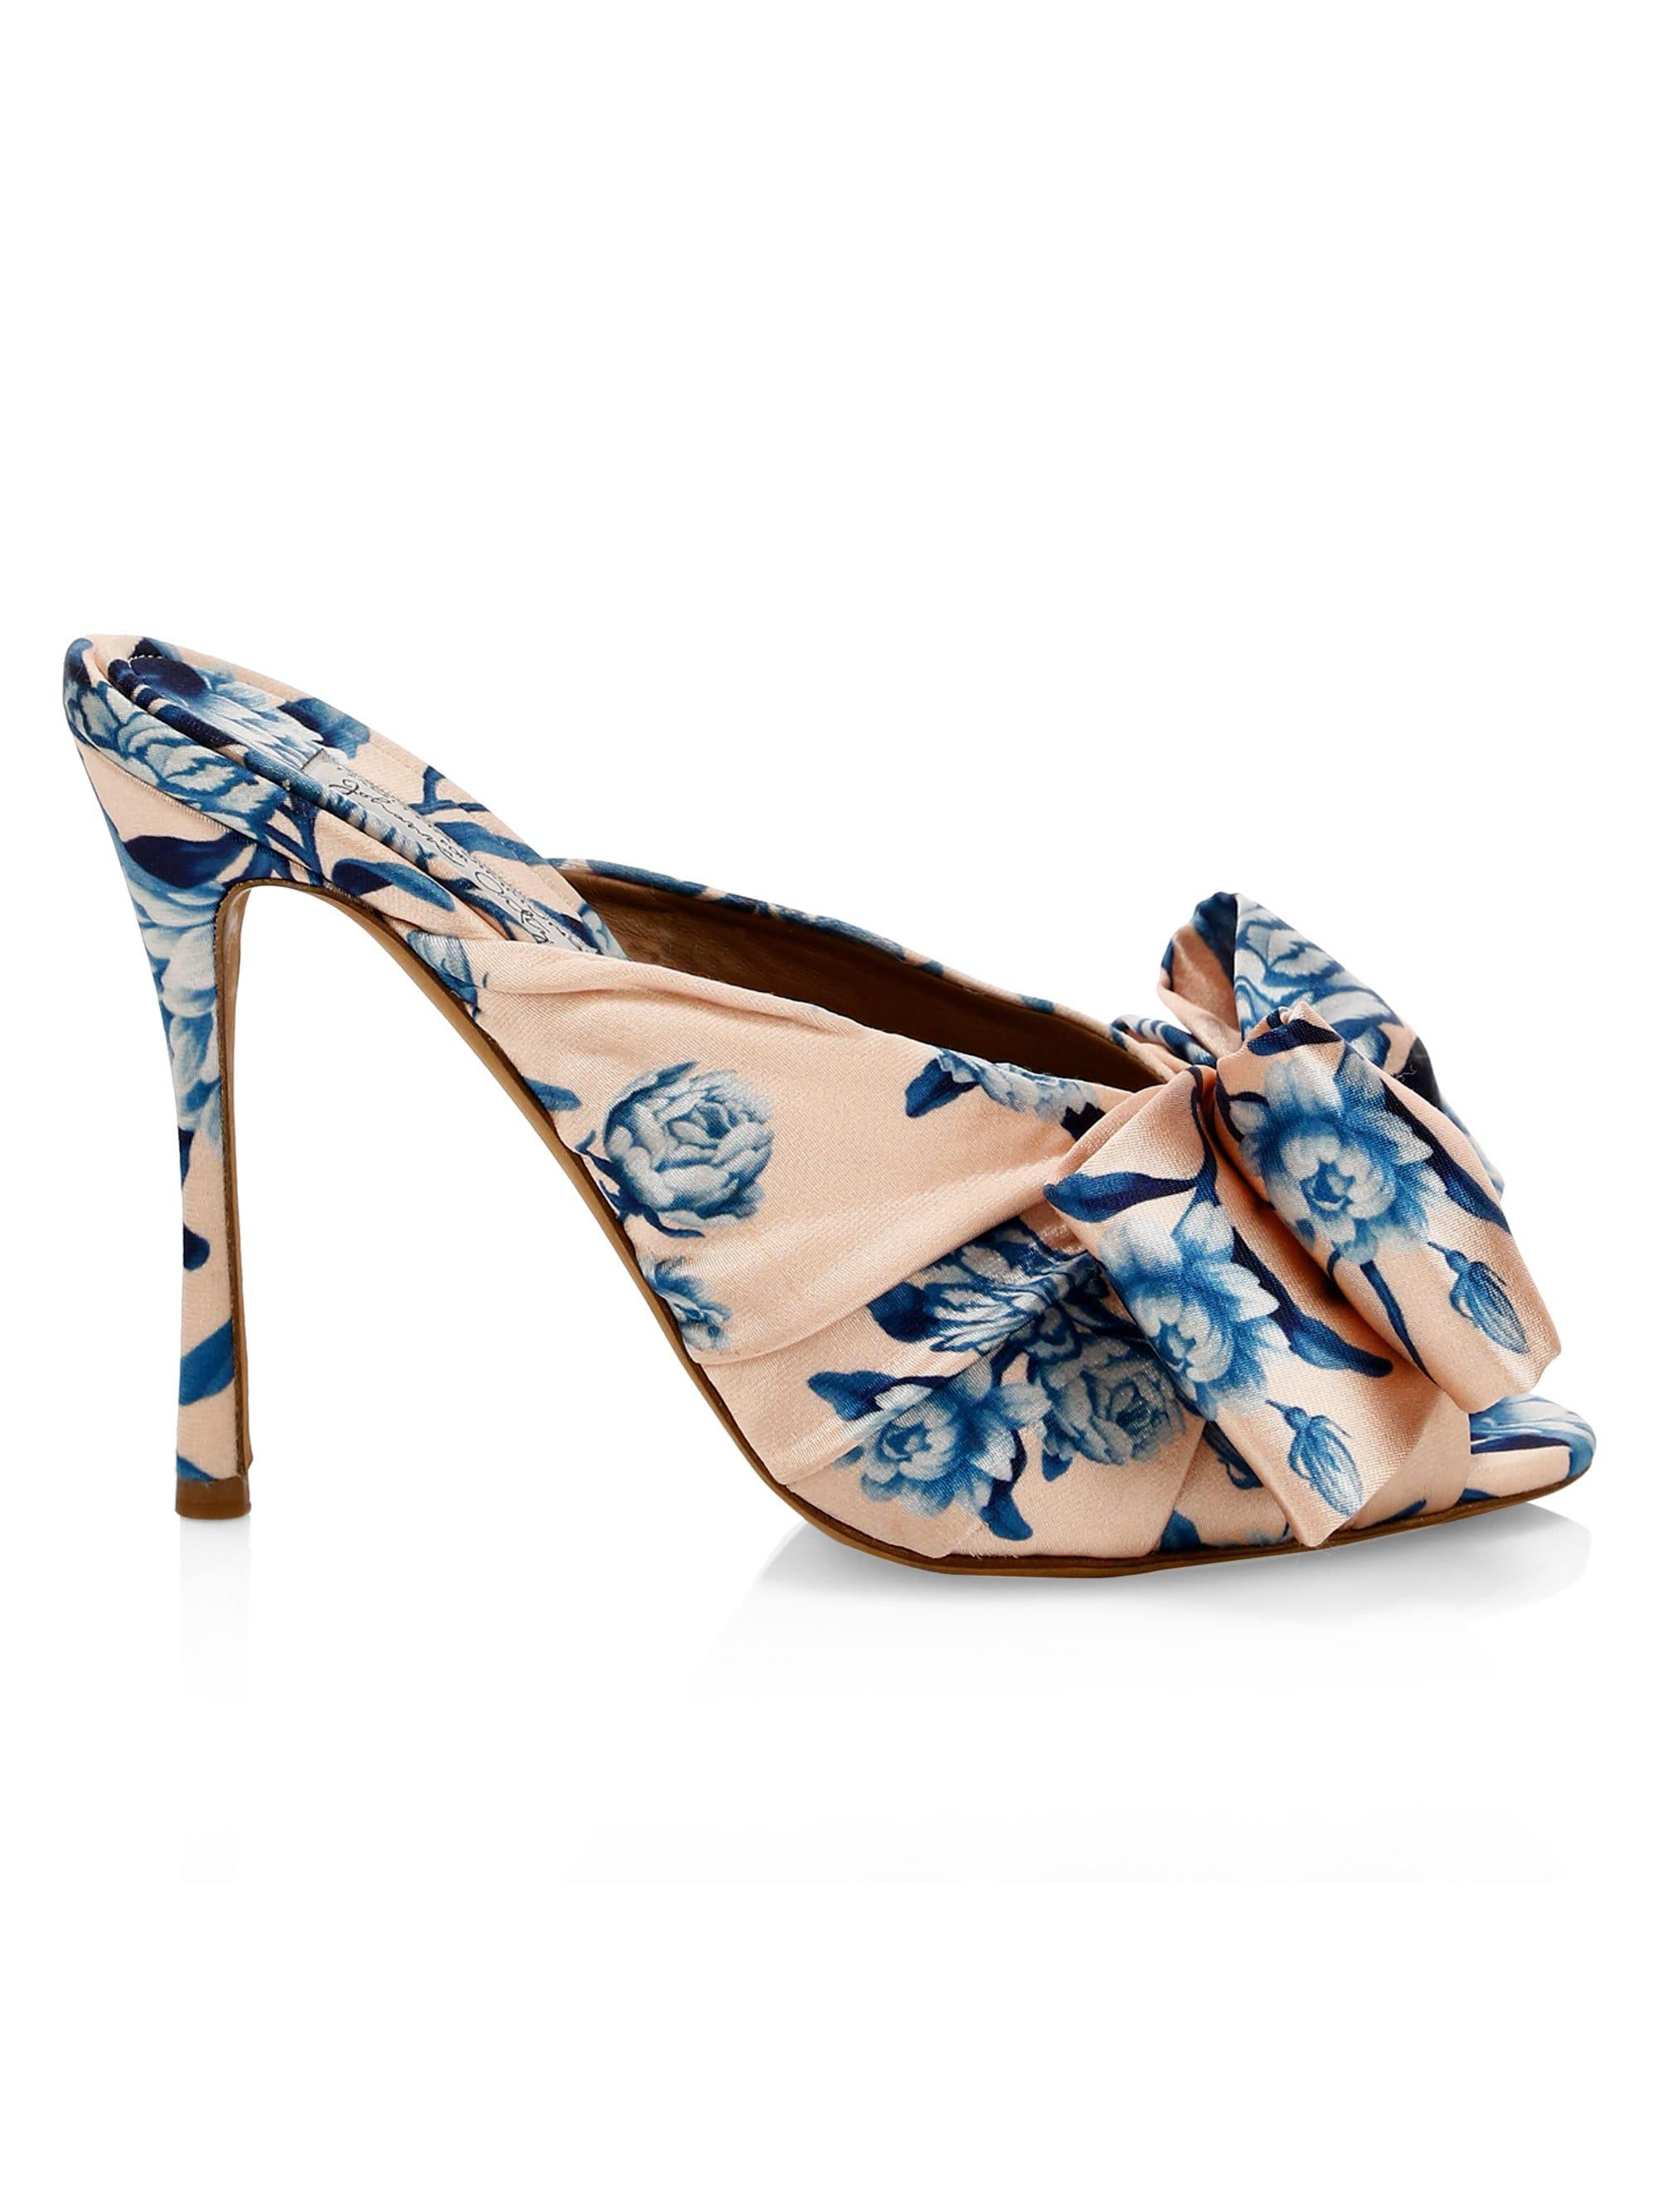 4d37093f6a0 Tabitha Simmons X Johanna Ortiz Lollie Silk Mules in Blue - Lyst